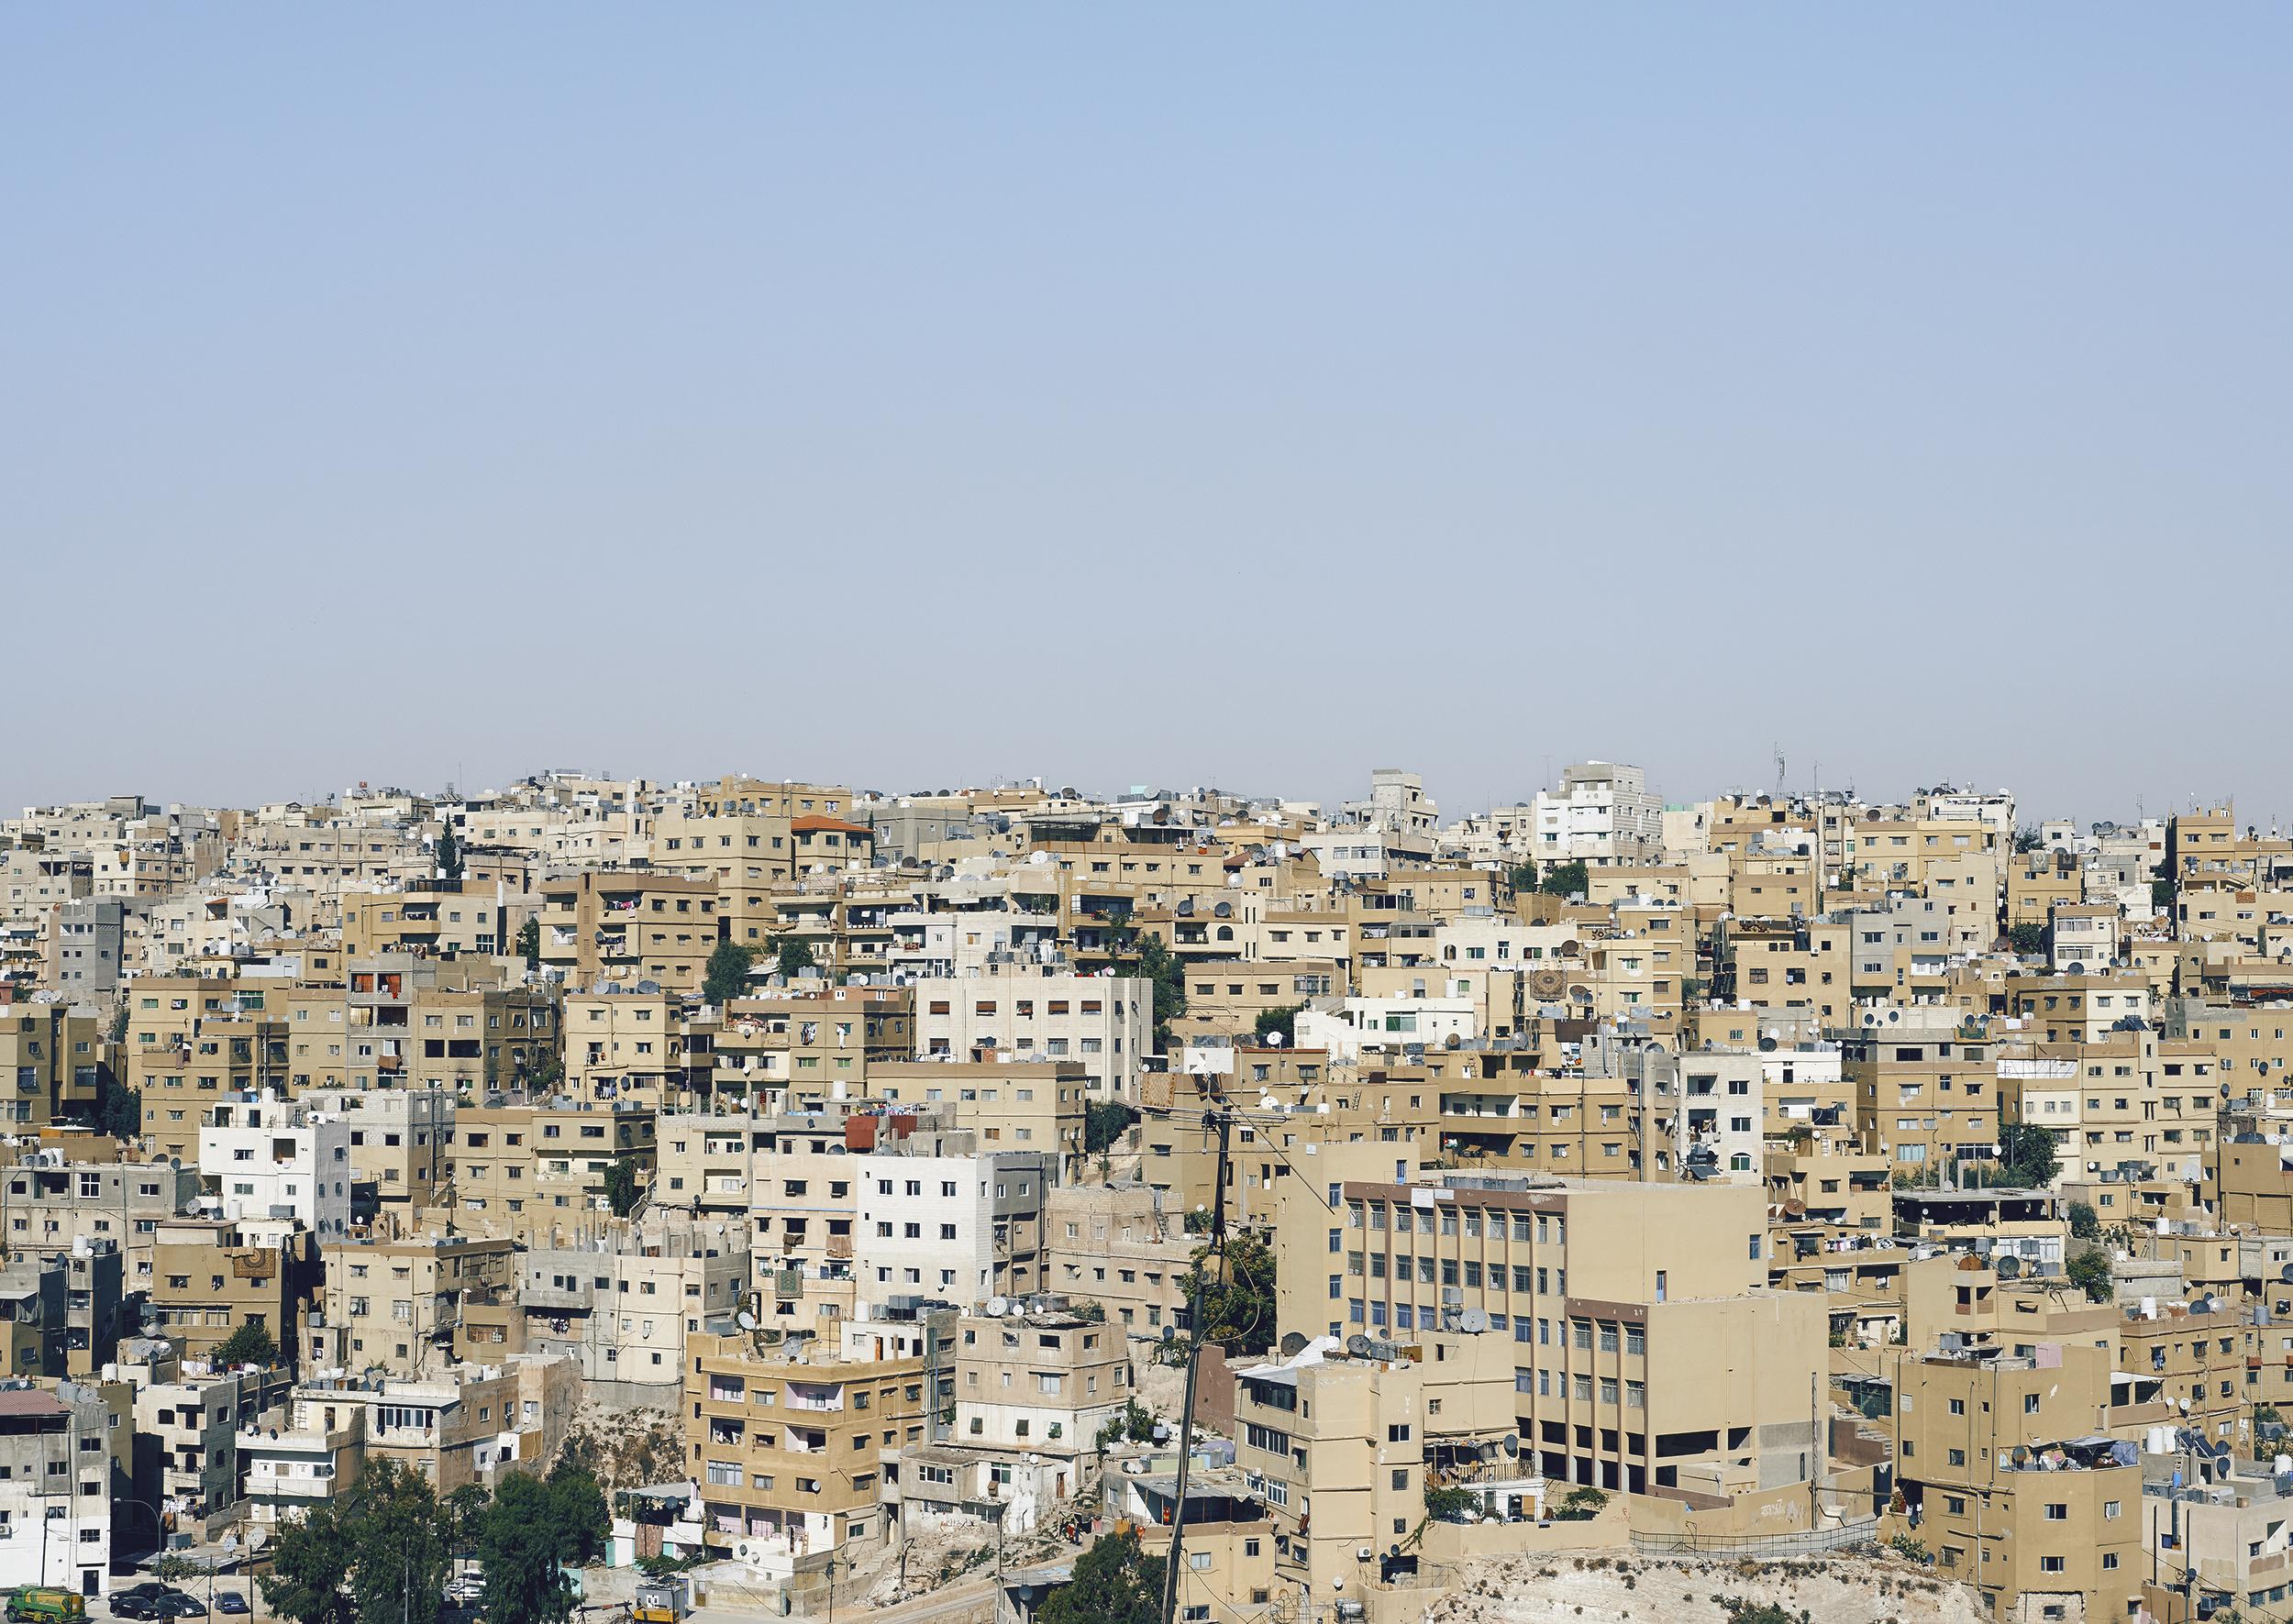 Friday, Amman, 2013